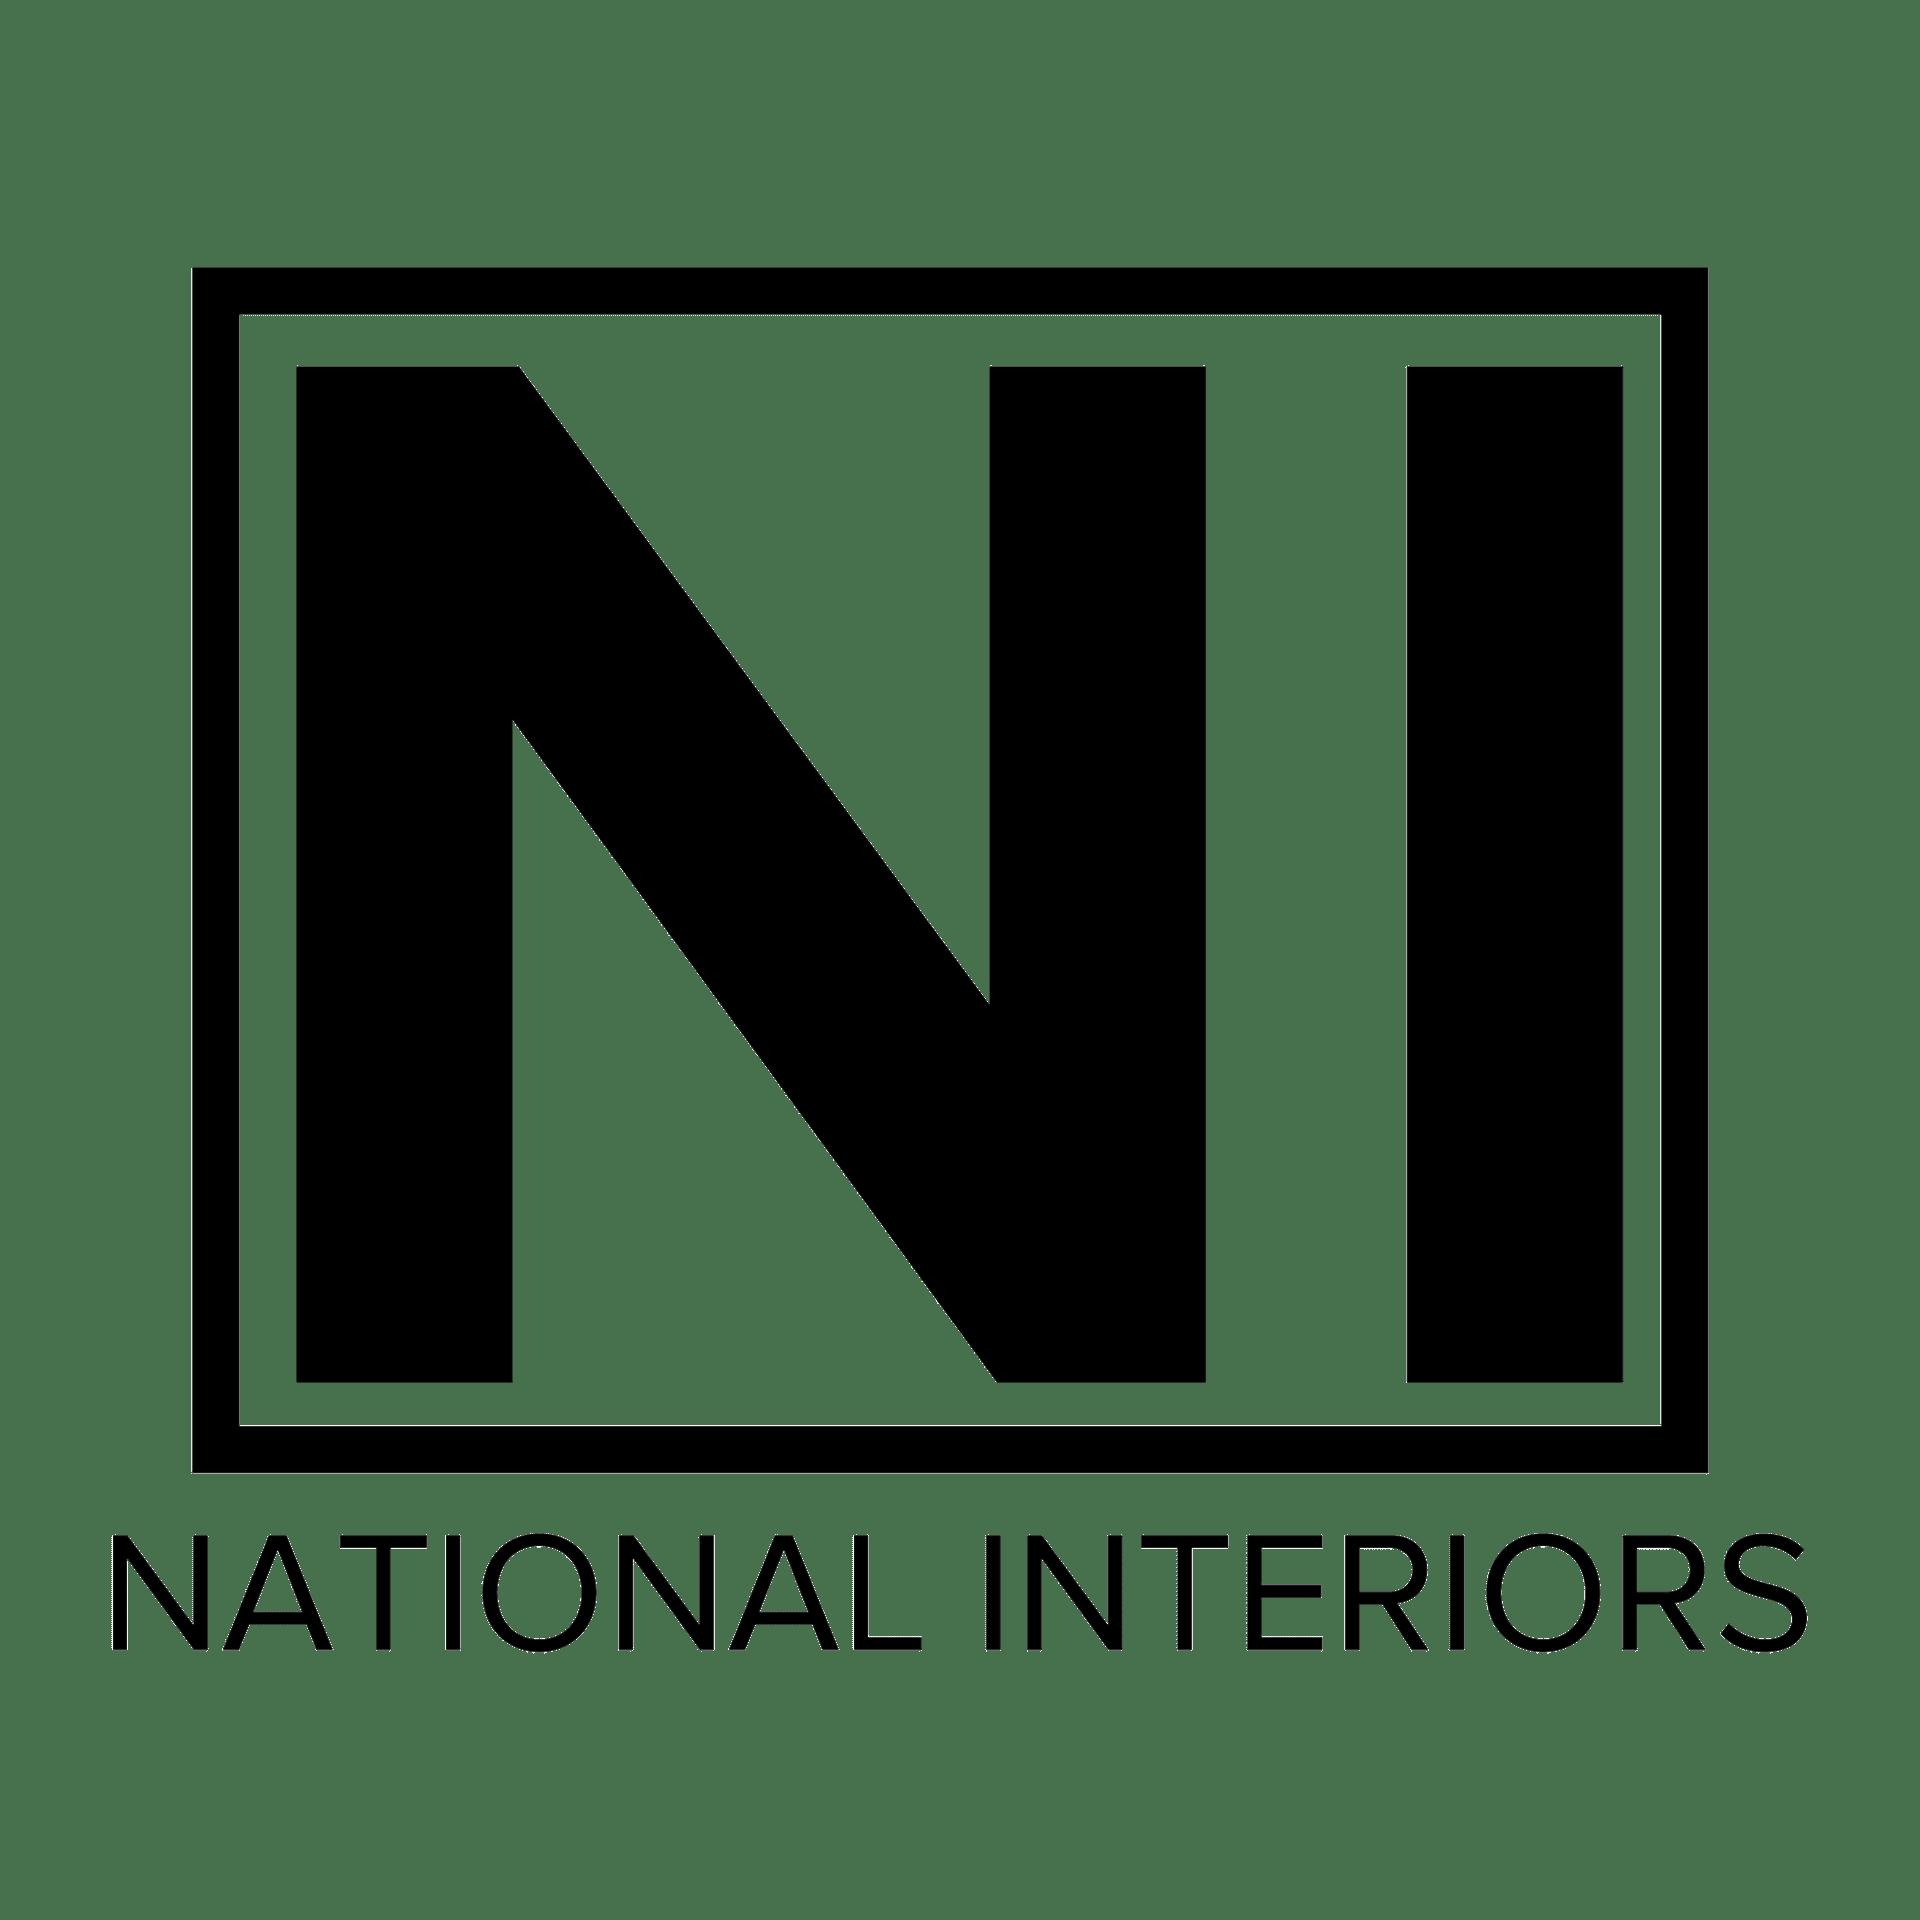 National Interiors in Winnipeg, MB